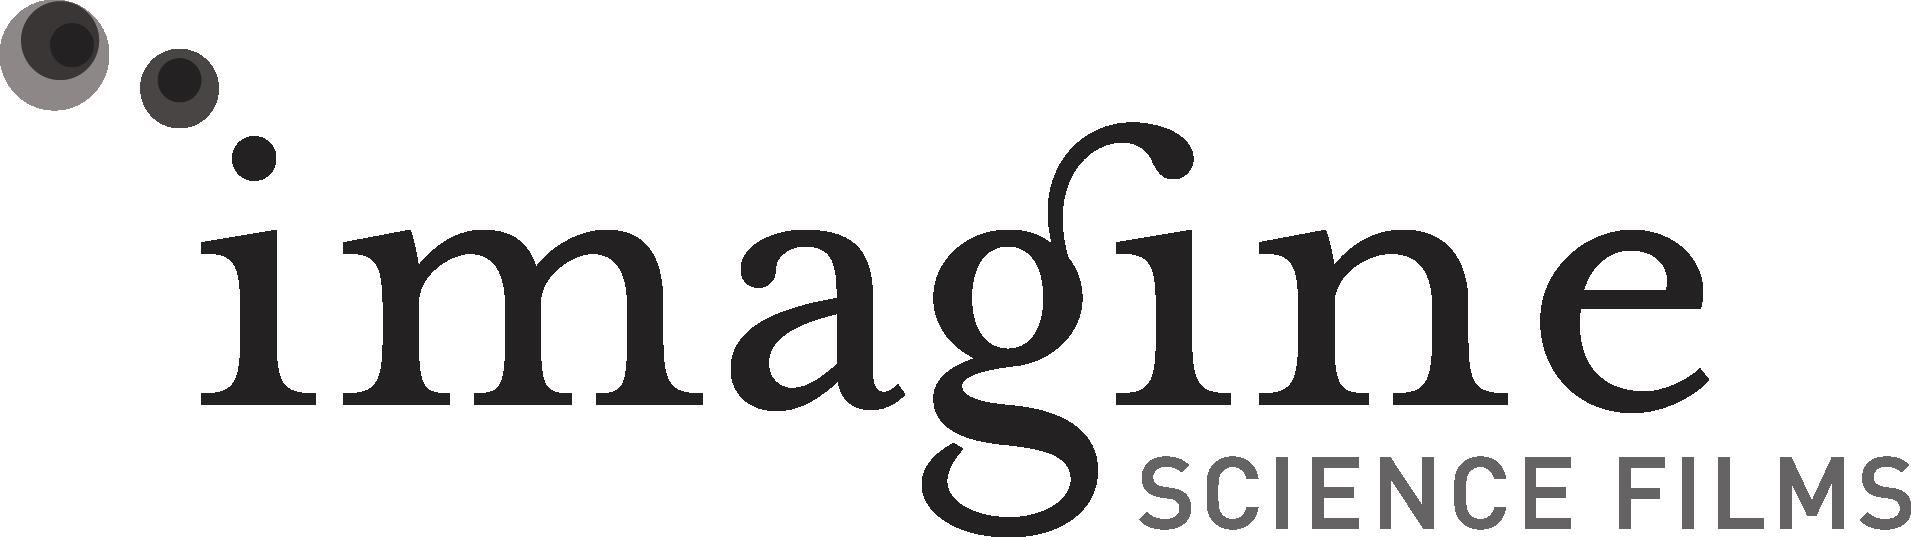 ImagineFilms-Logo-DarkGray (1).png